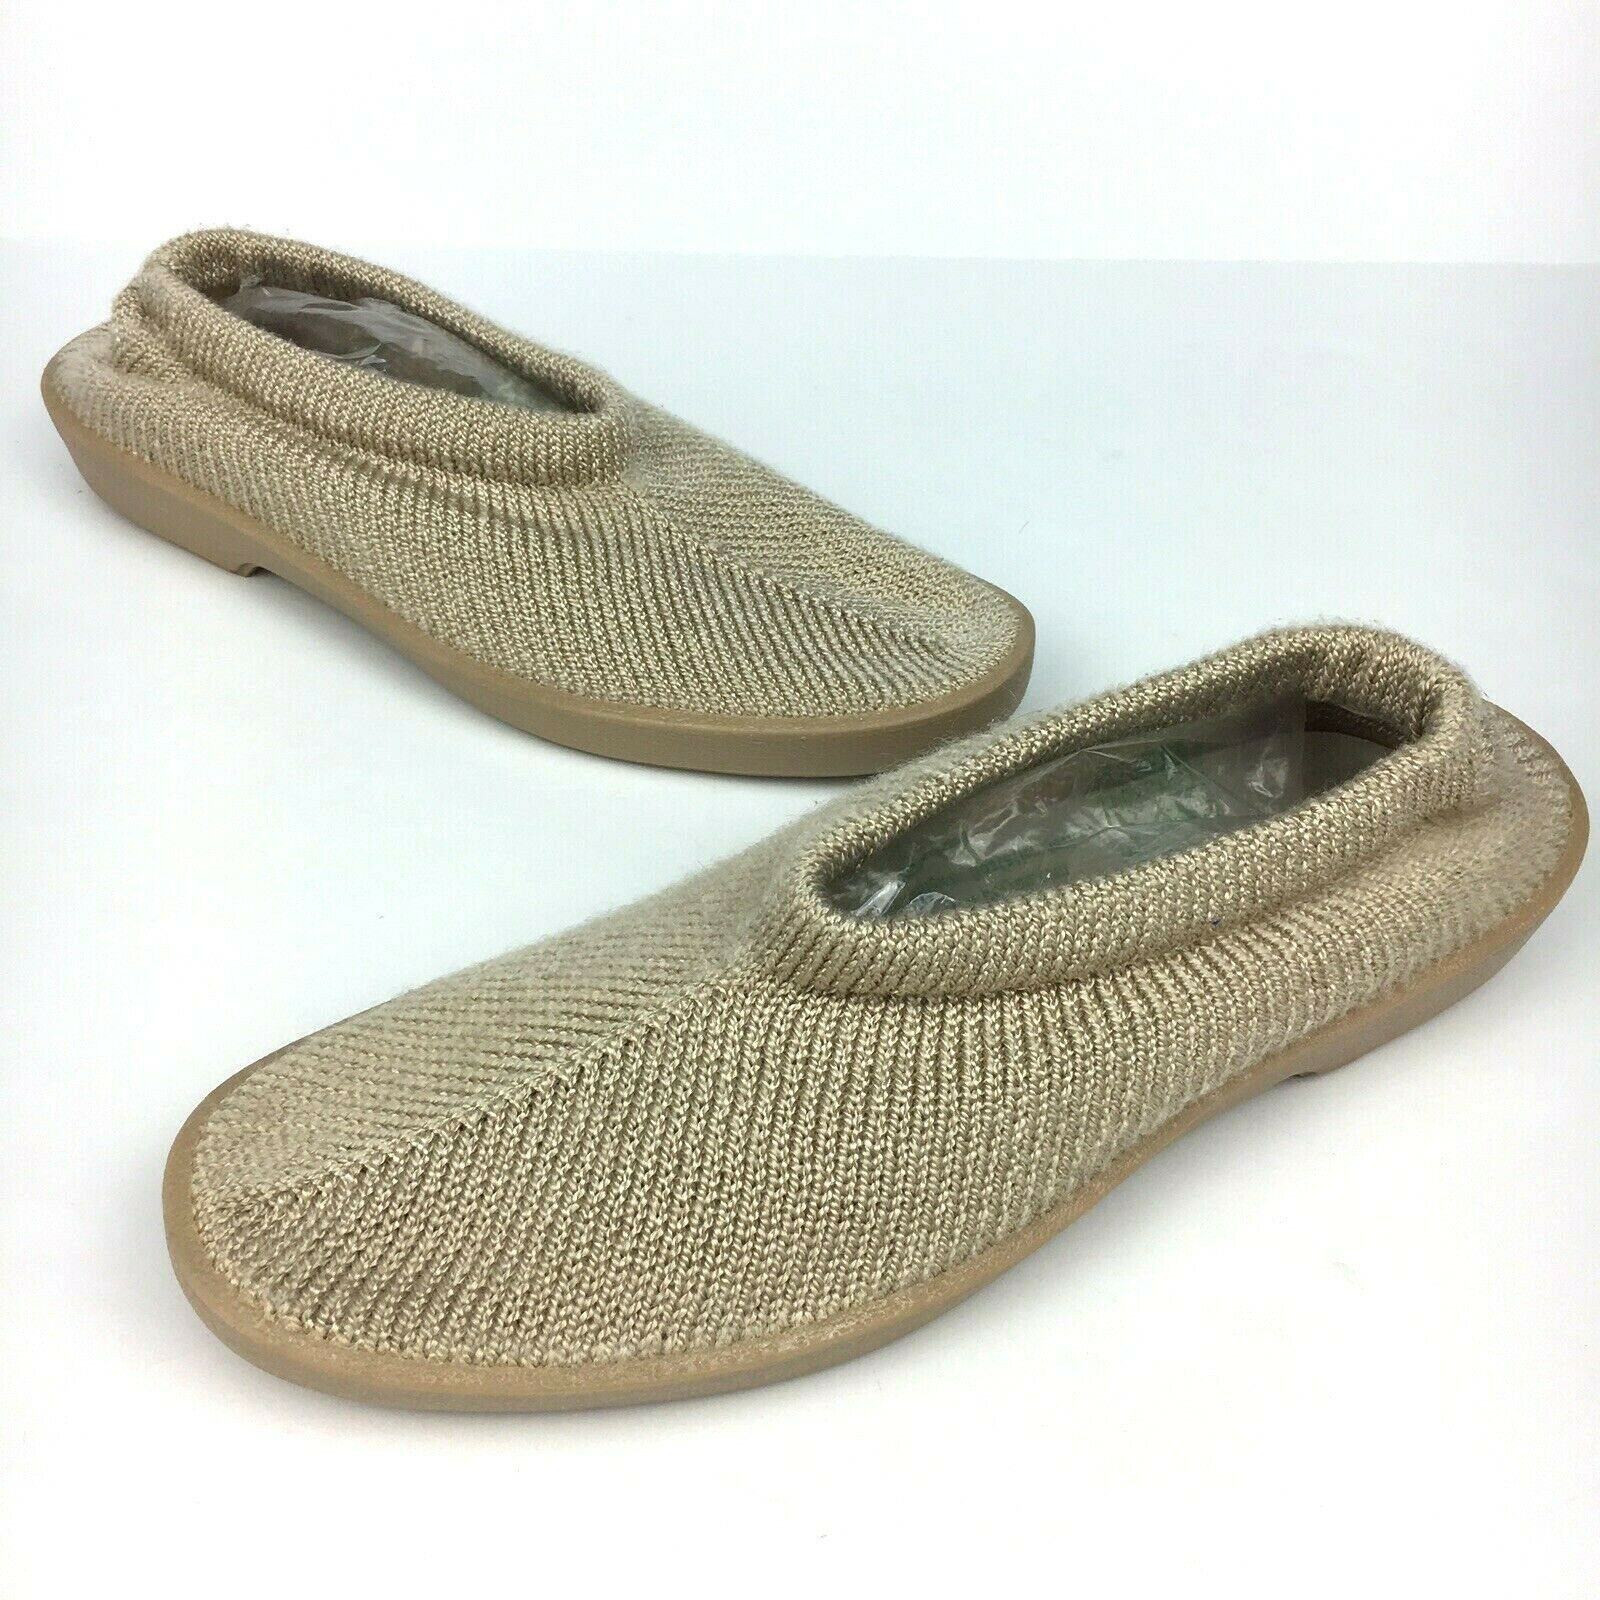 Arcopedico New Sec Slip On shoes EUR Size 42 Womens 10.5 Beige Knit Mesh